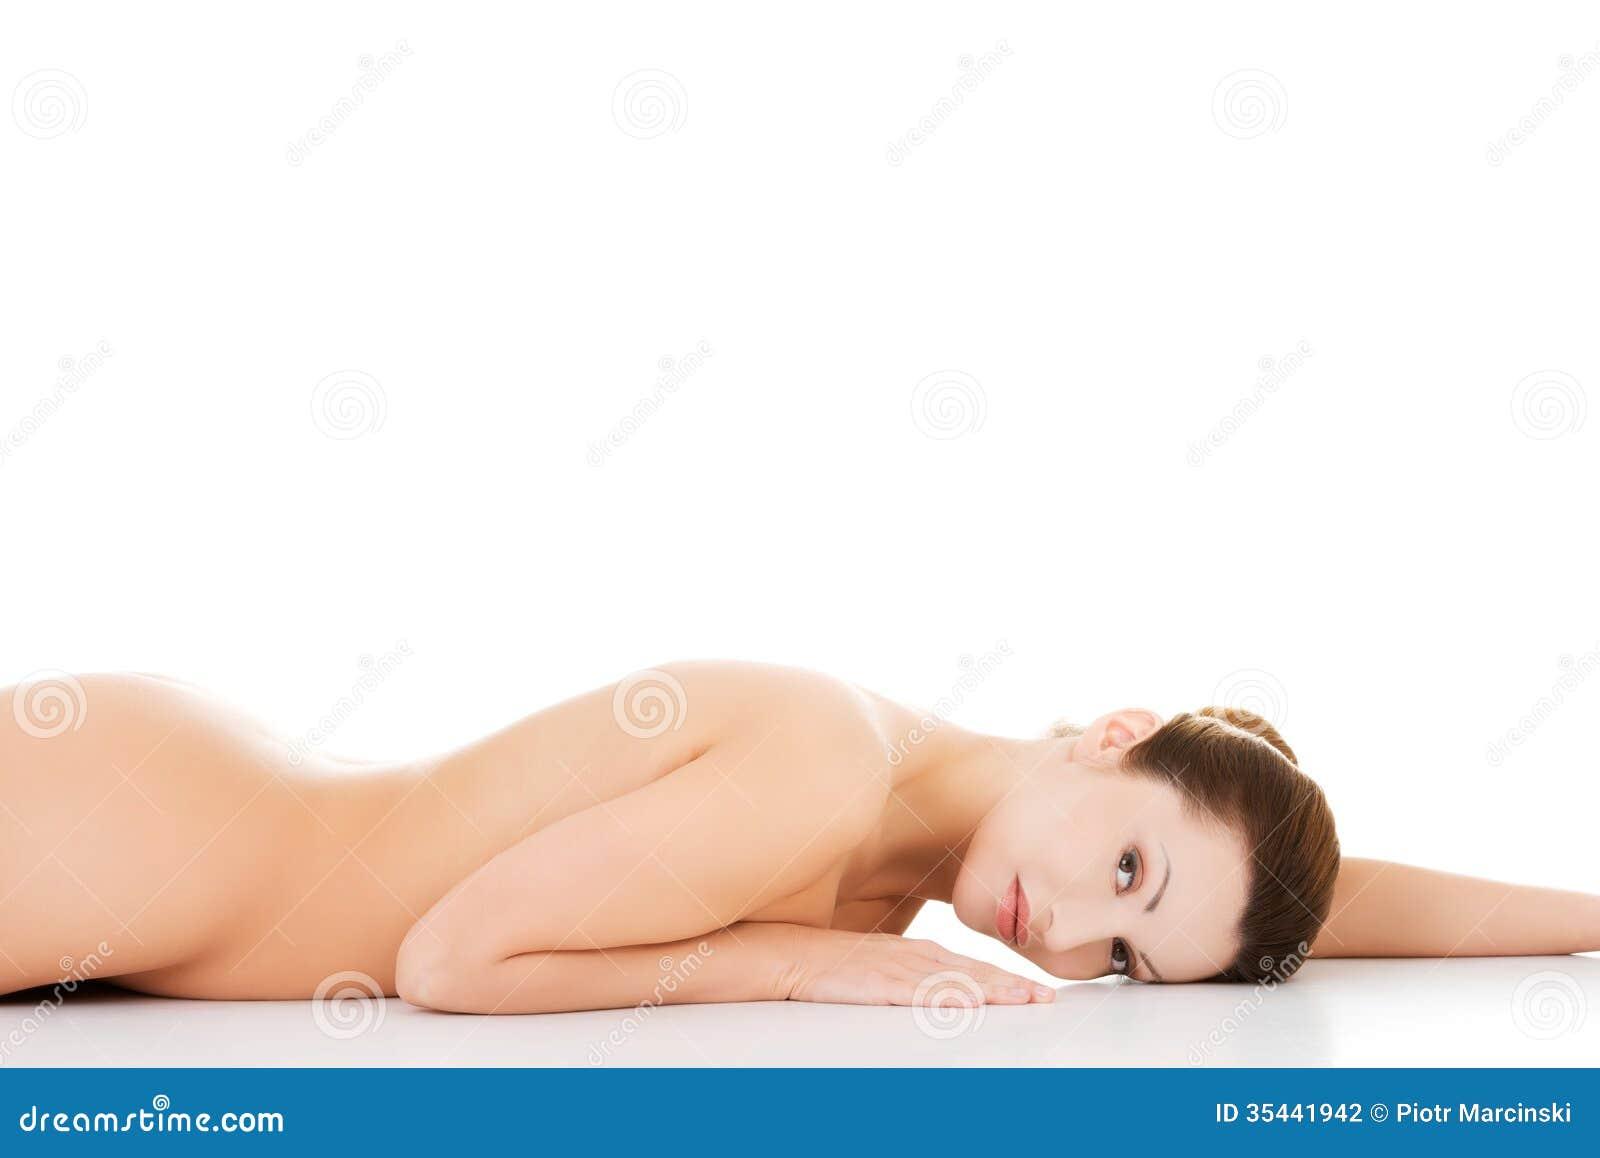 from Mustafa girls lying down naked